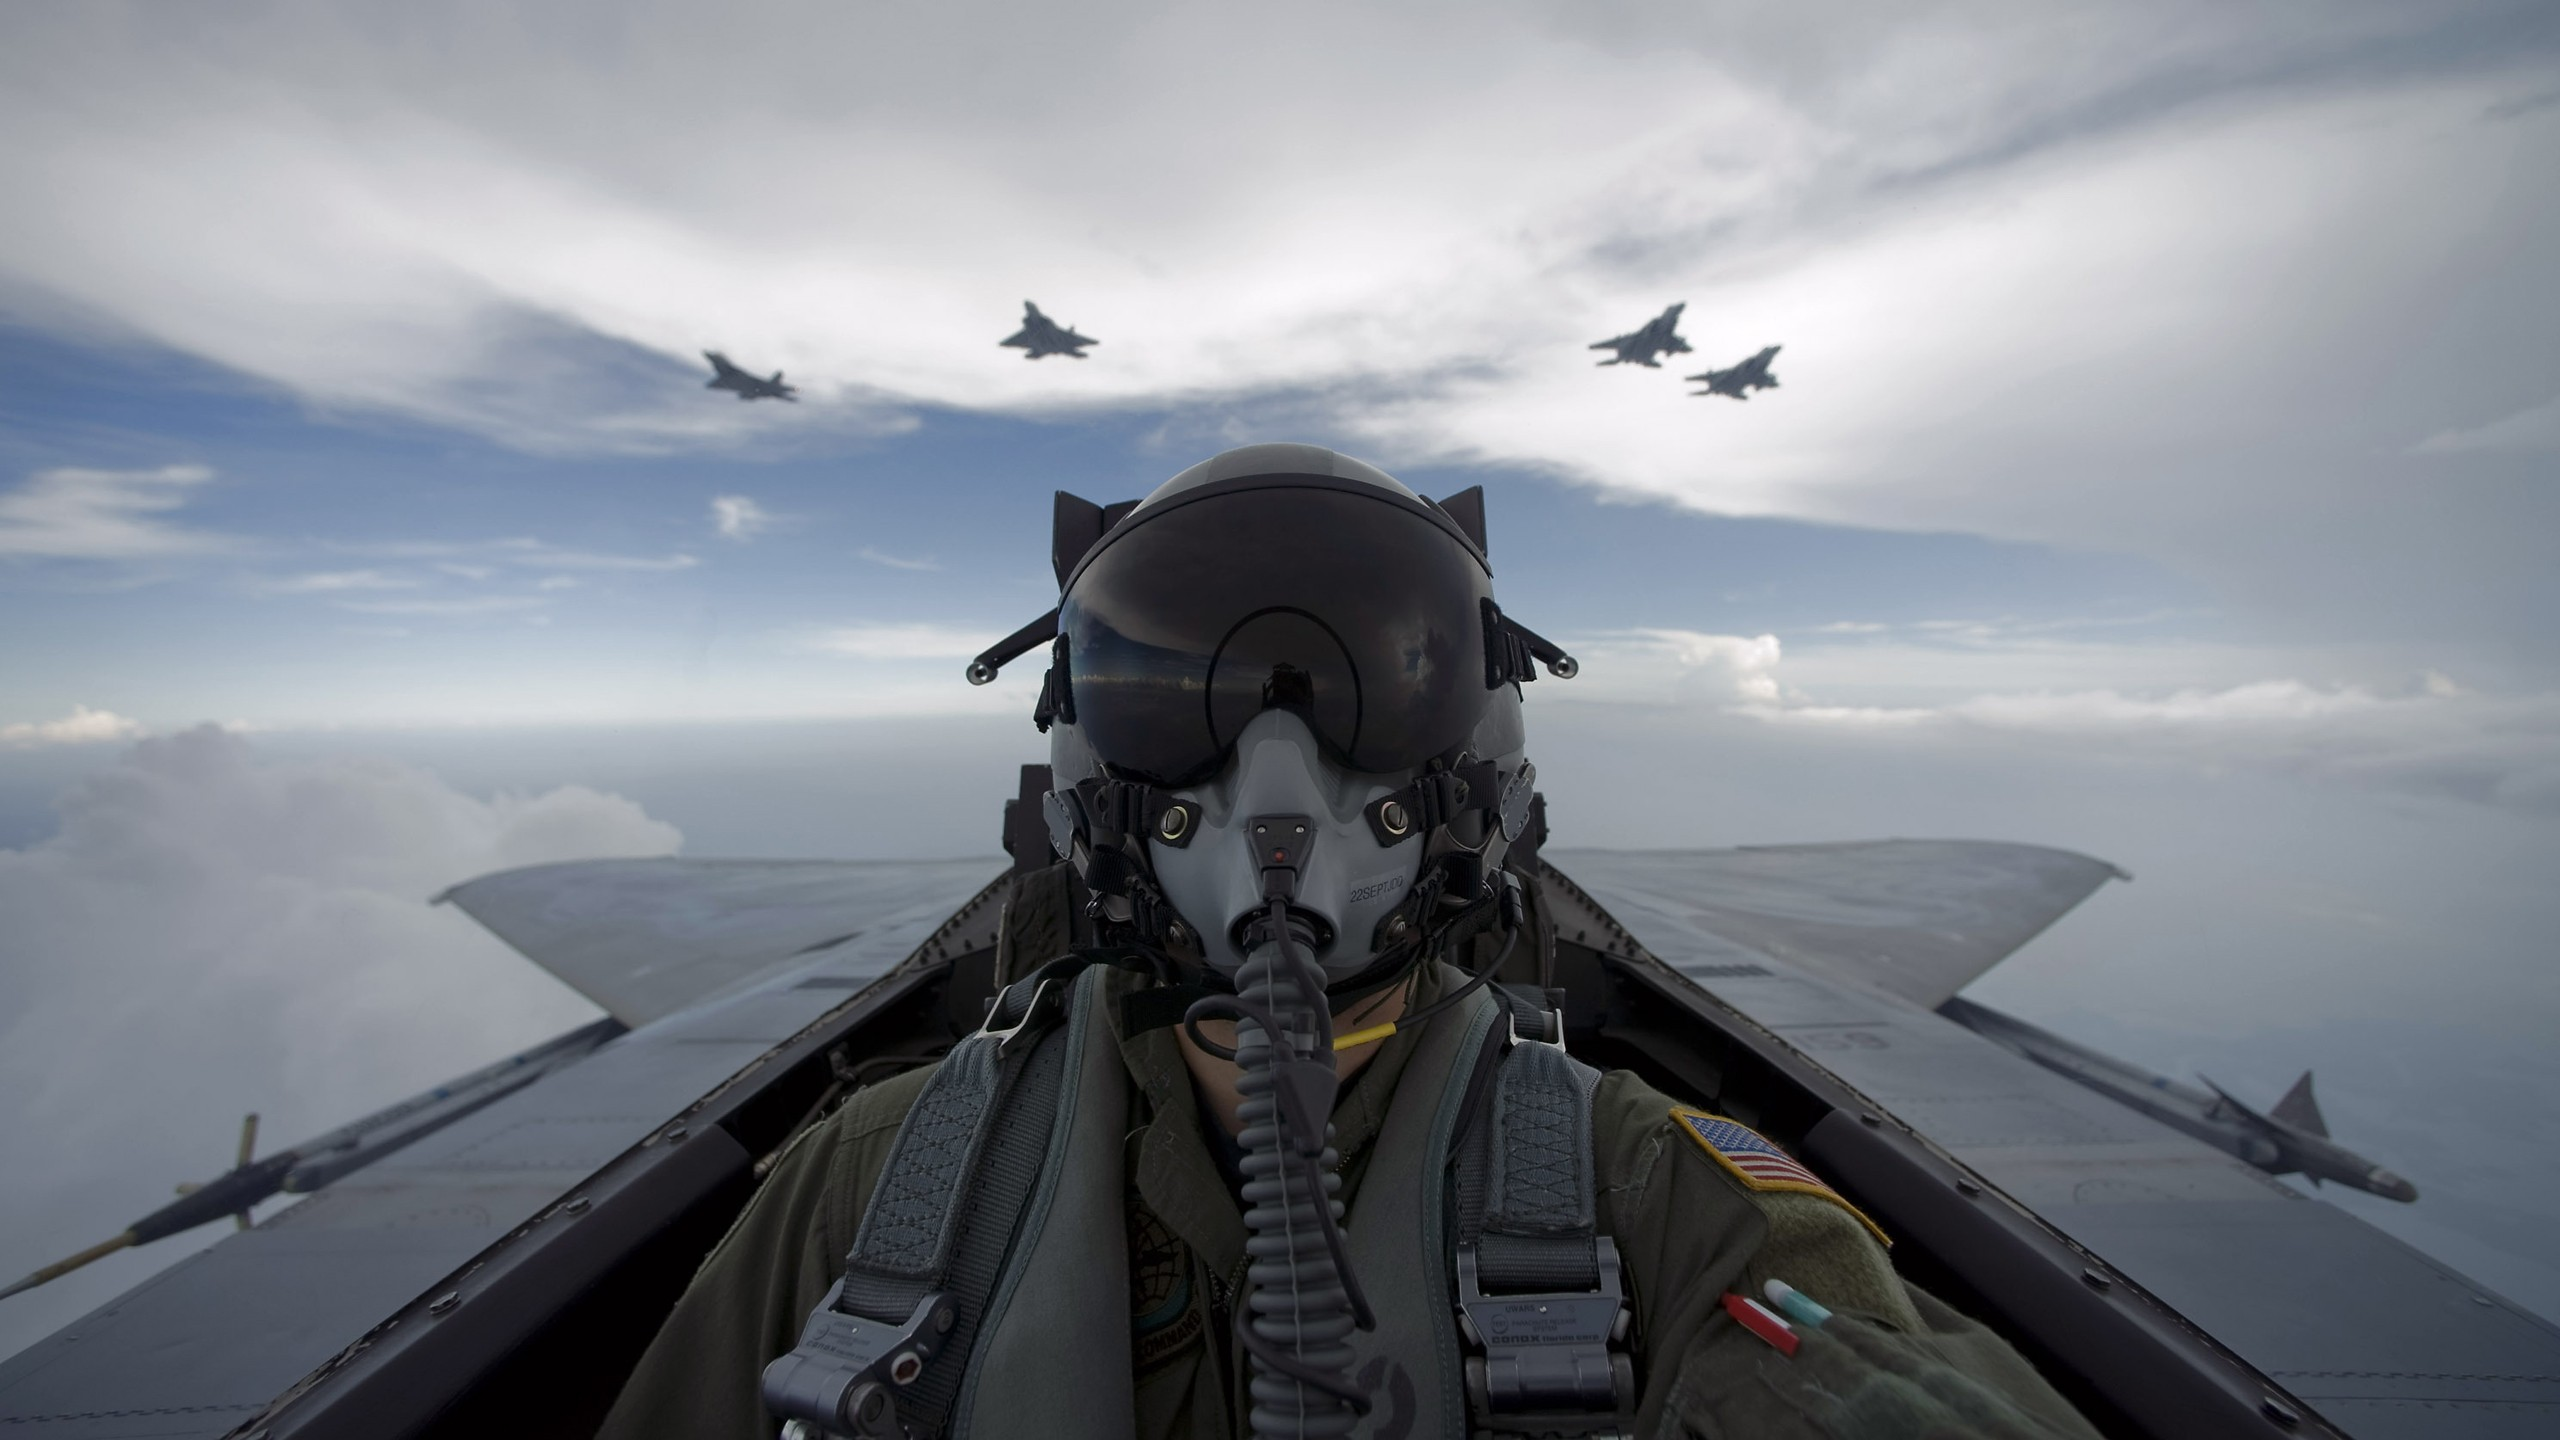 Aircraft Military Pilot Hd Wallpaper Background Image